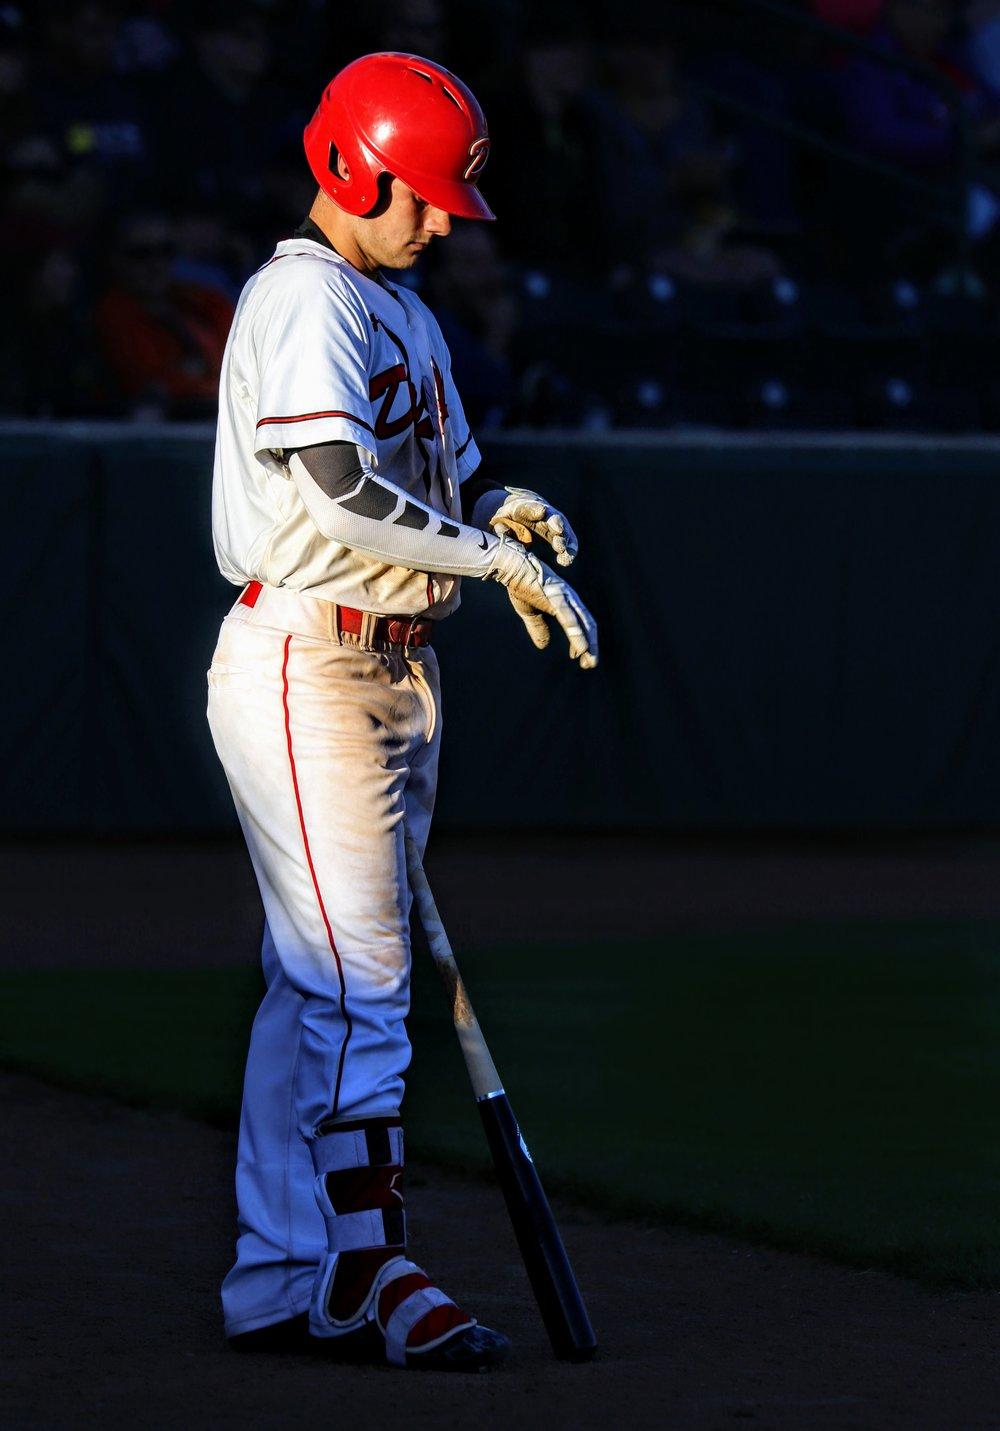 Okotoks Dawgs shortstop Peter Hutzal prepares for an at bat. Photo Credit: Amanda Fewer